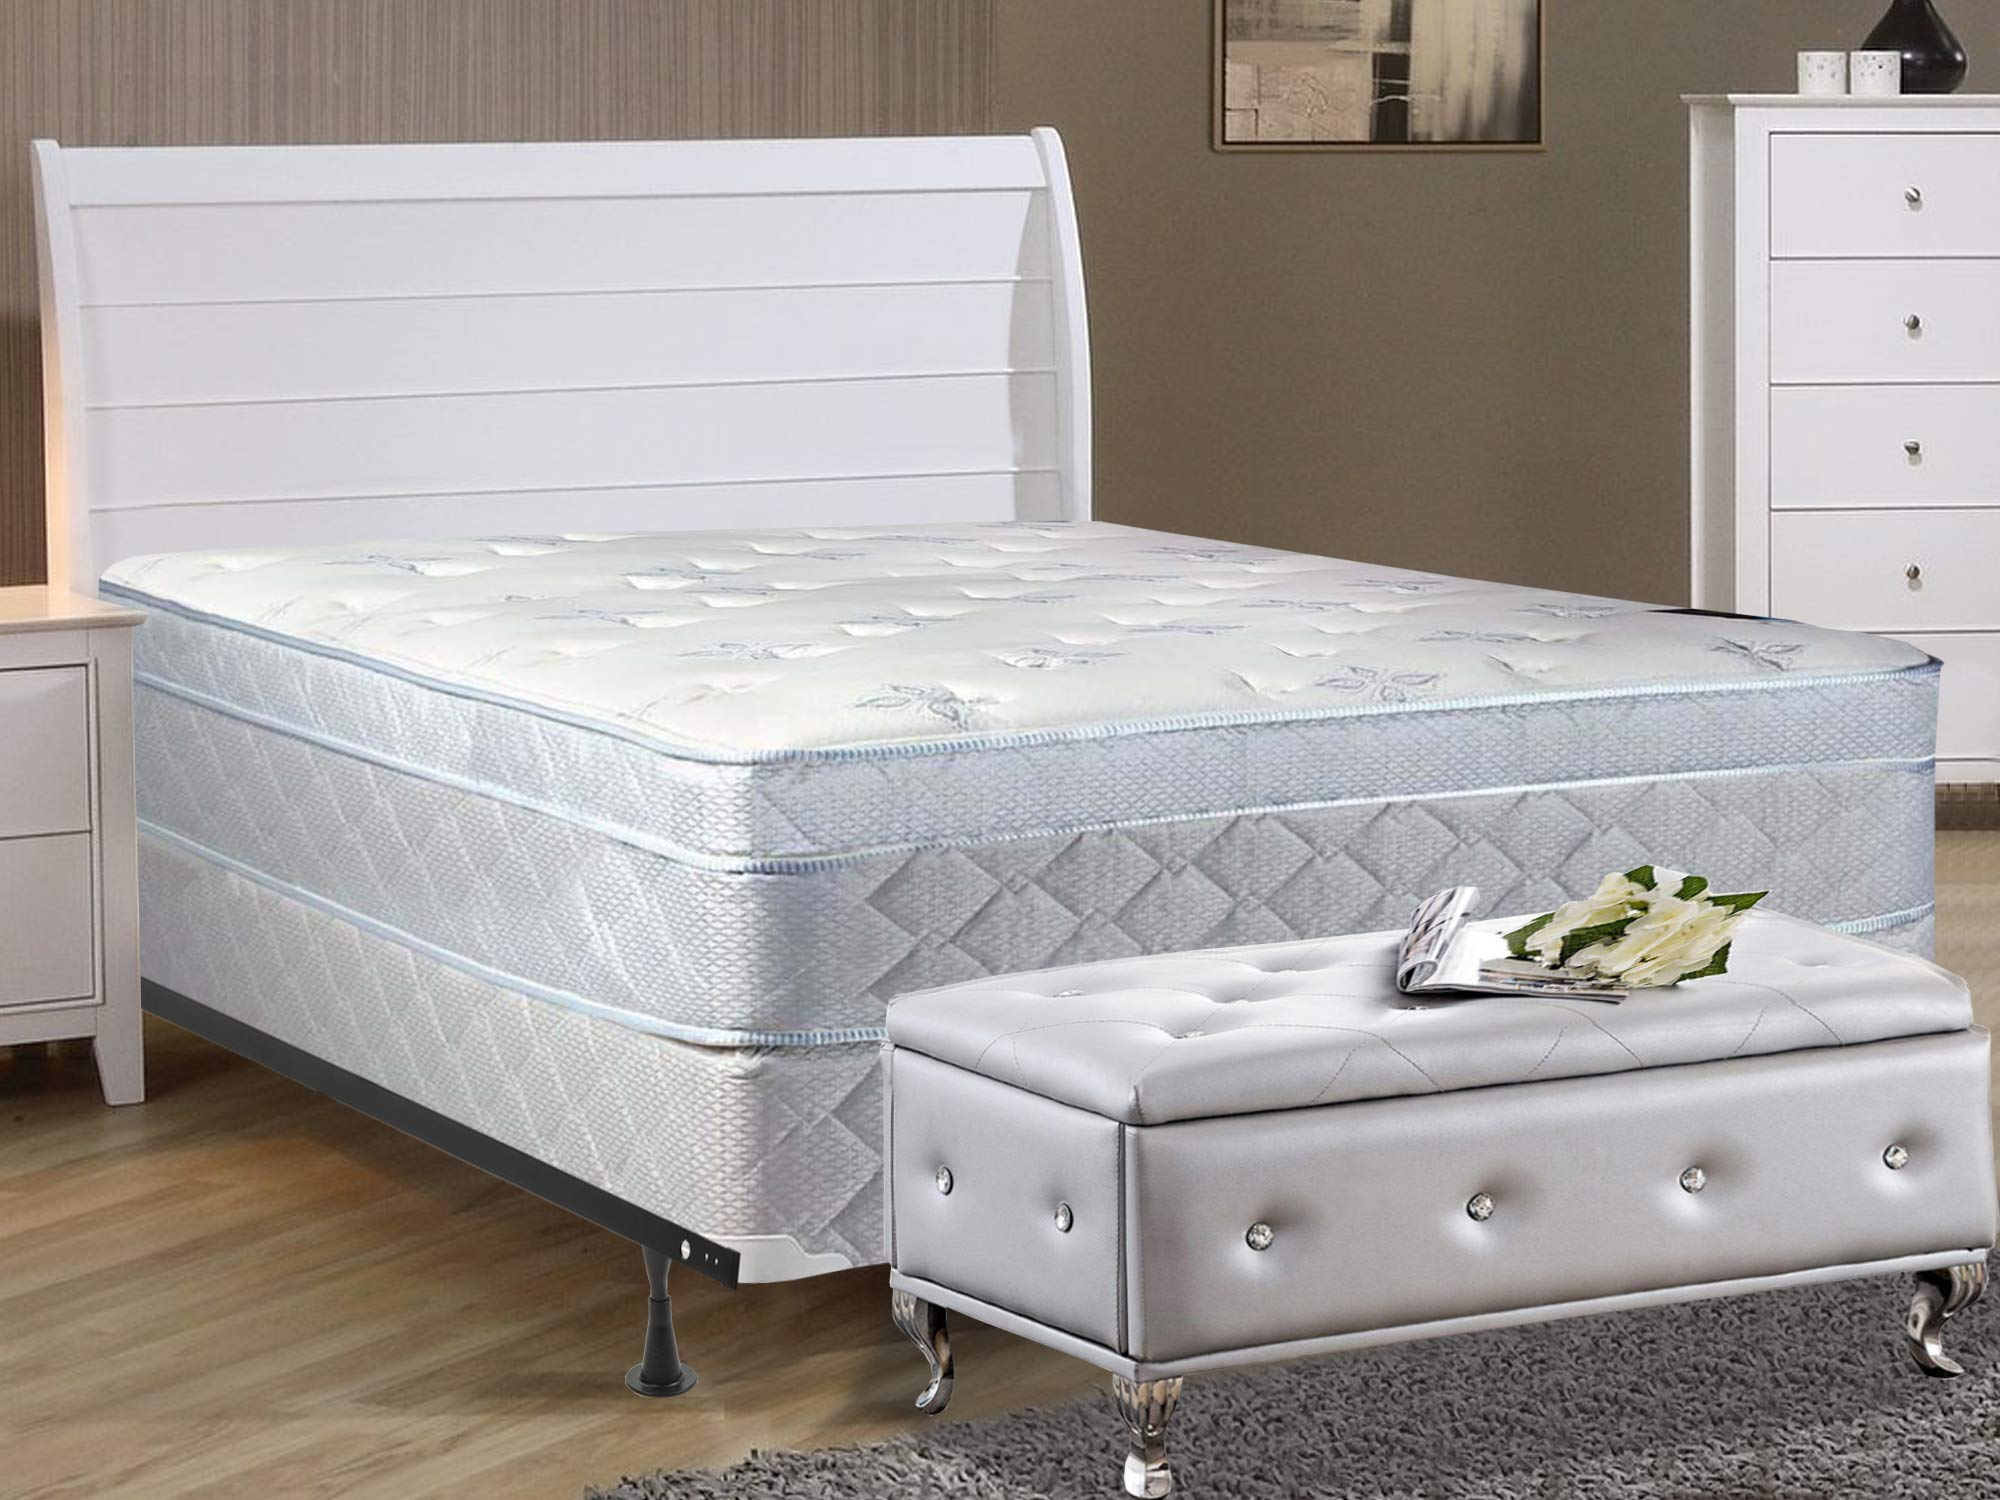 Continental Sleep 10-inch Plush Mattress, Full, Size by Continental Sleep